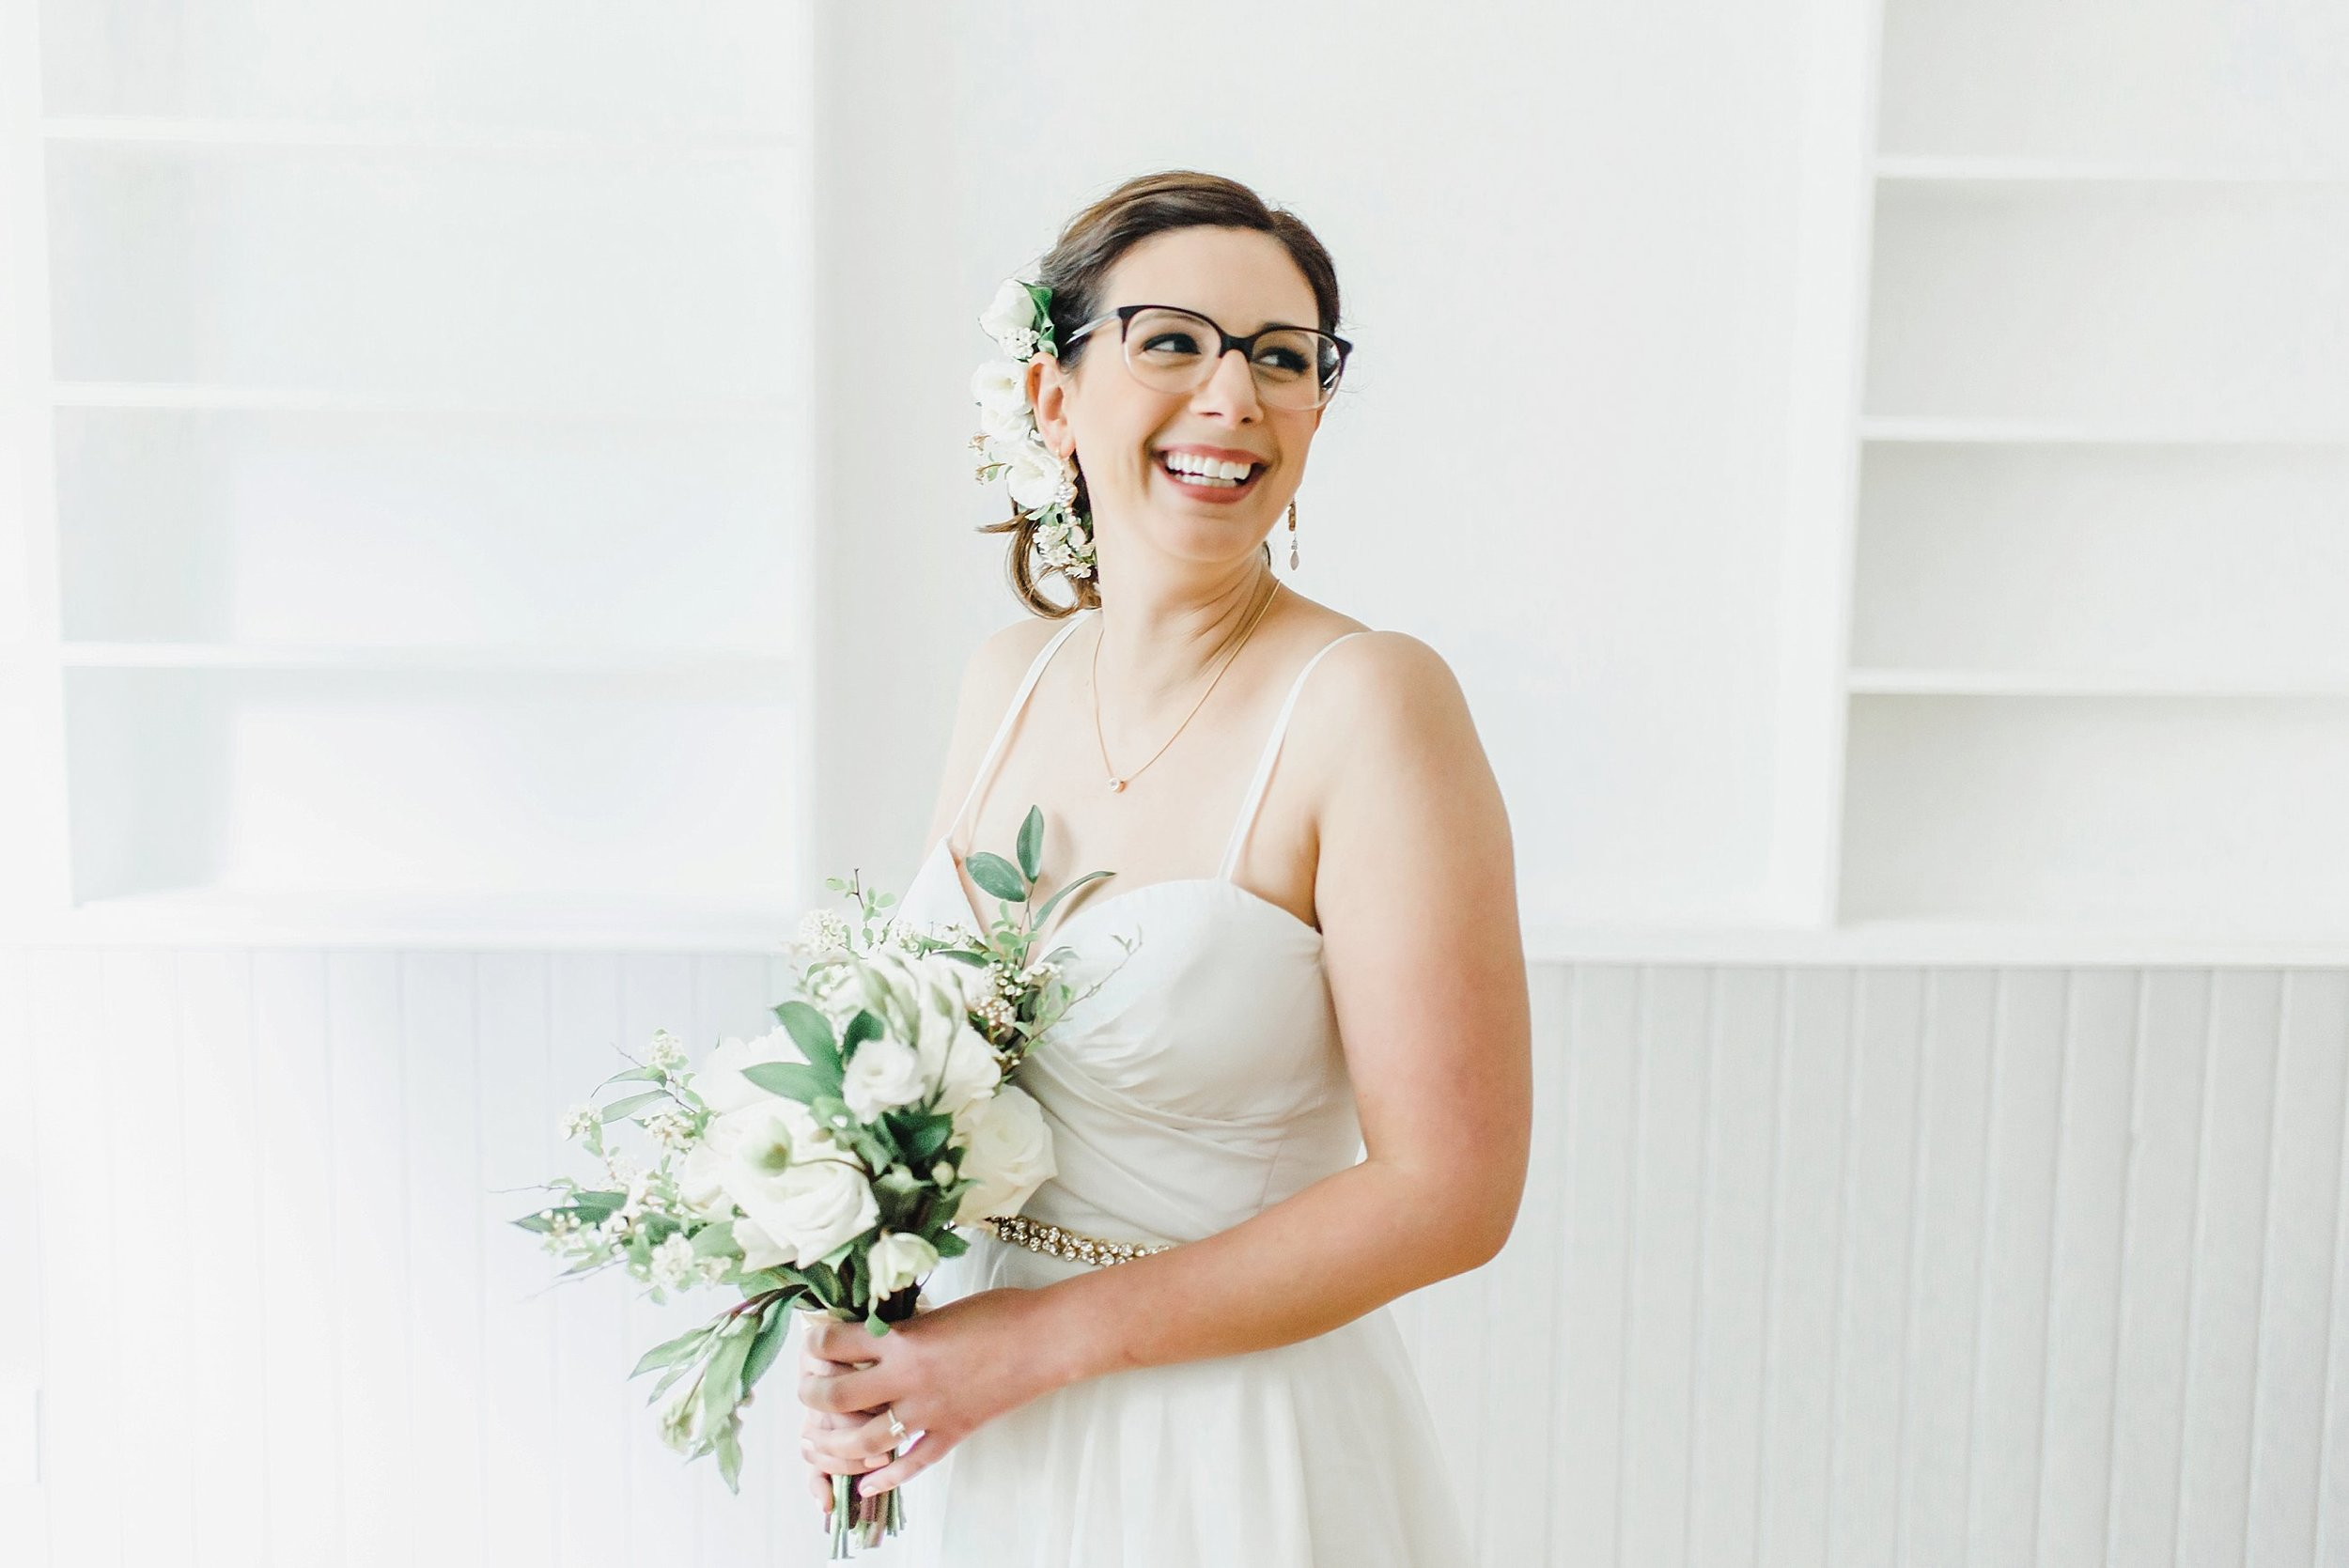 light airy indie fine art ottawa wedding photographer | Ali and Batoul Photography_1684.jpg